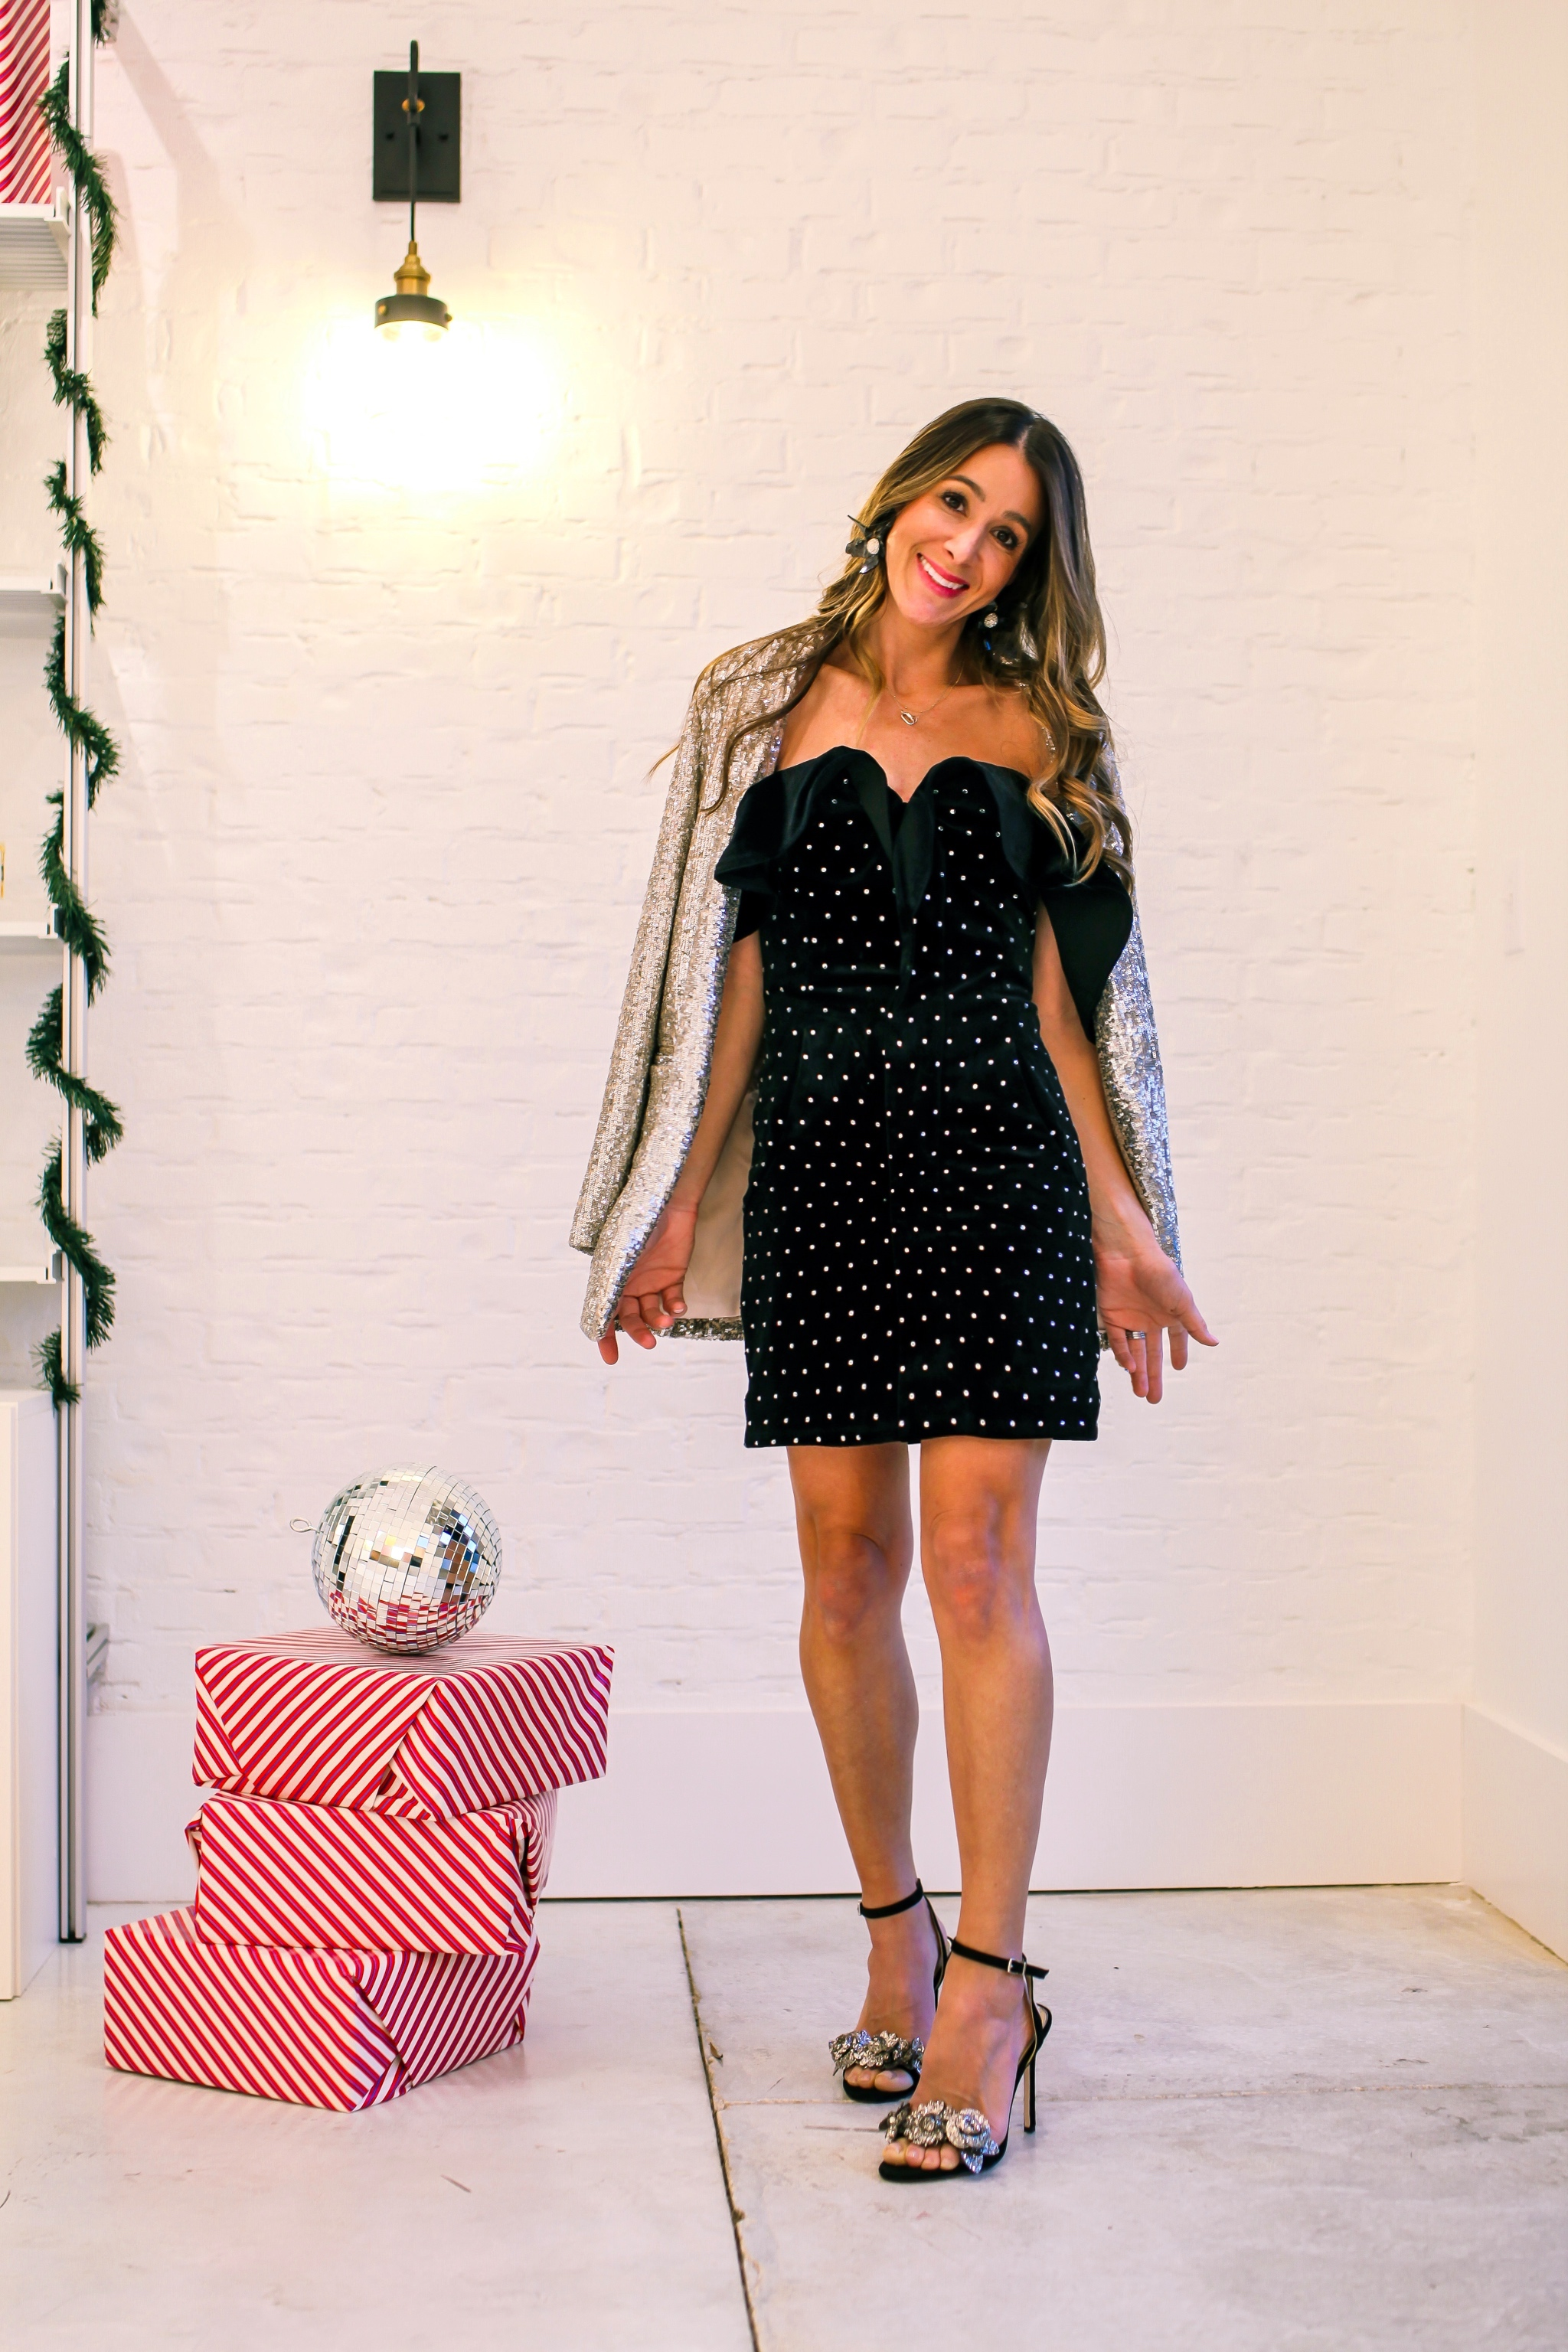 DRESS - SELF PORTRAIT -  HERE  | SHOES - JESSICA SIMPSON -  DILLARDS  | SEQUIN BLAZER -  DILLARDS  | EARRINGS - LELE SADOUGHI |